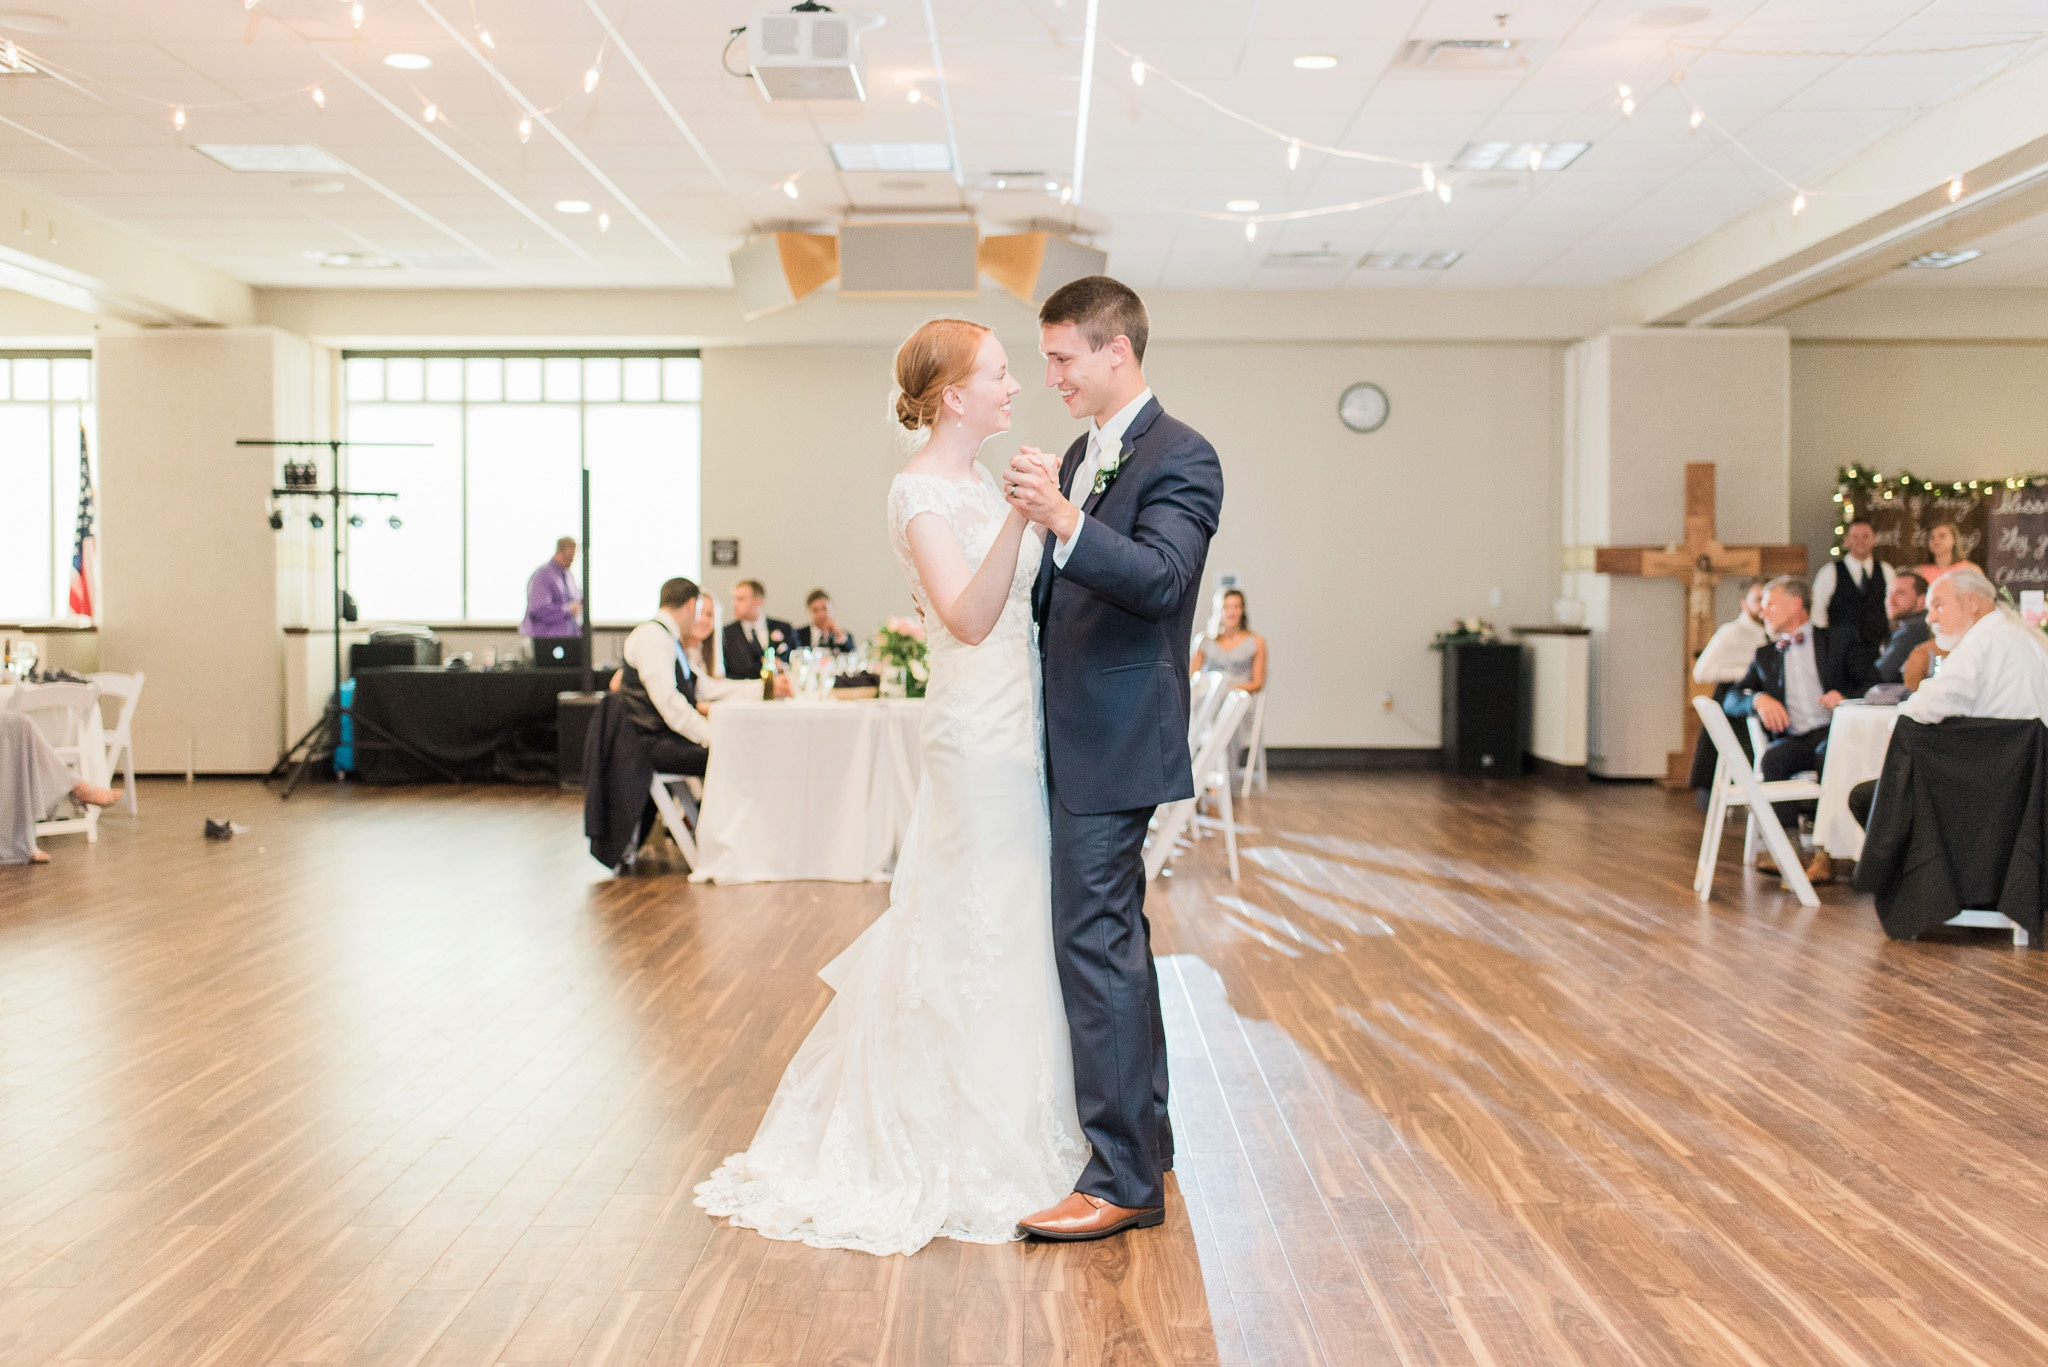 sunbury-ohio-wedding-hannah-johnathan_0136.jpg